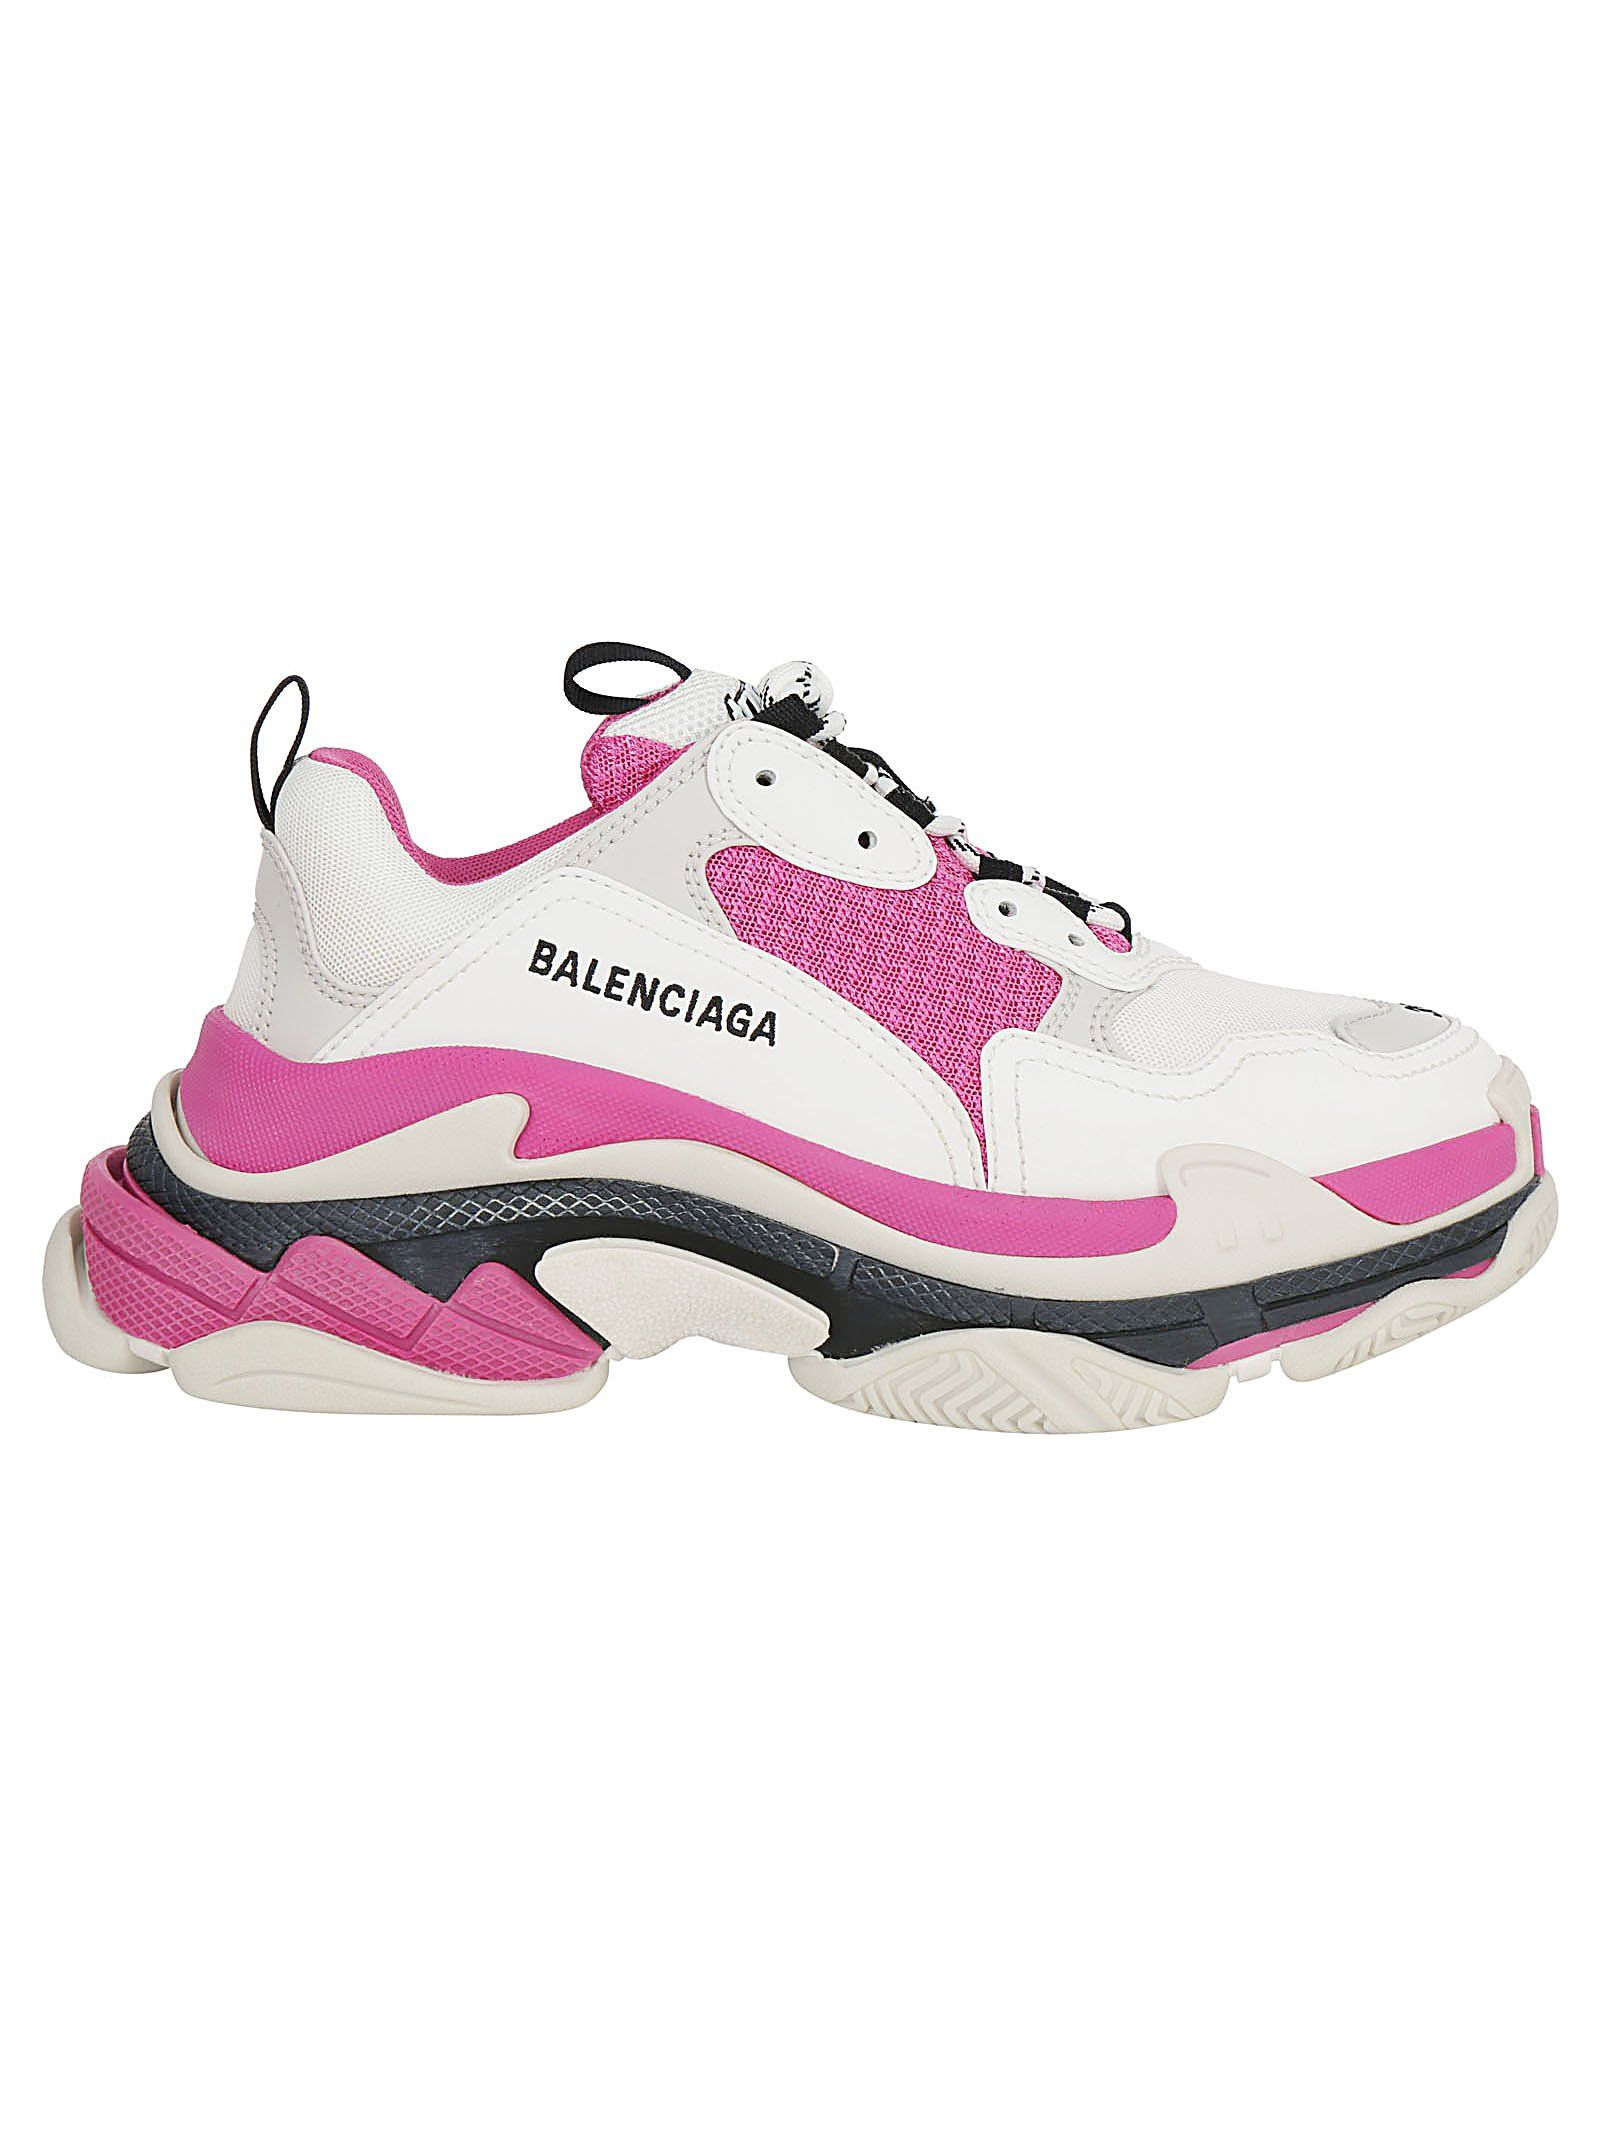 Balenciaga Triple S Pink Mesh And